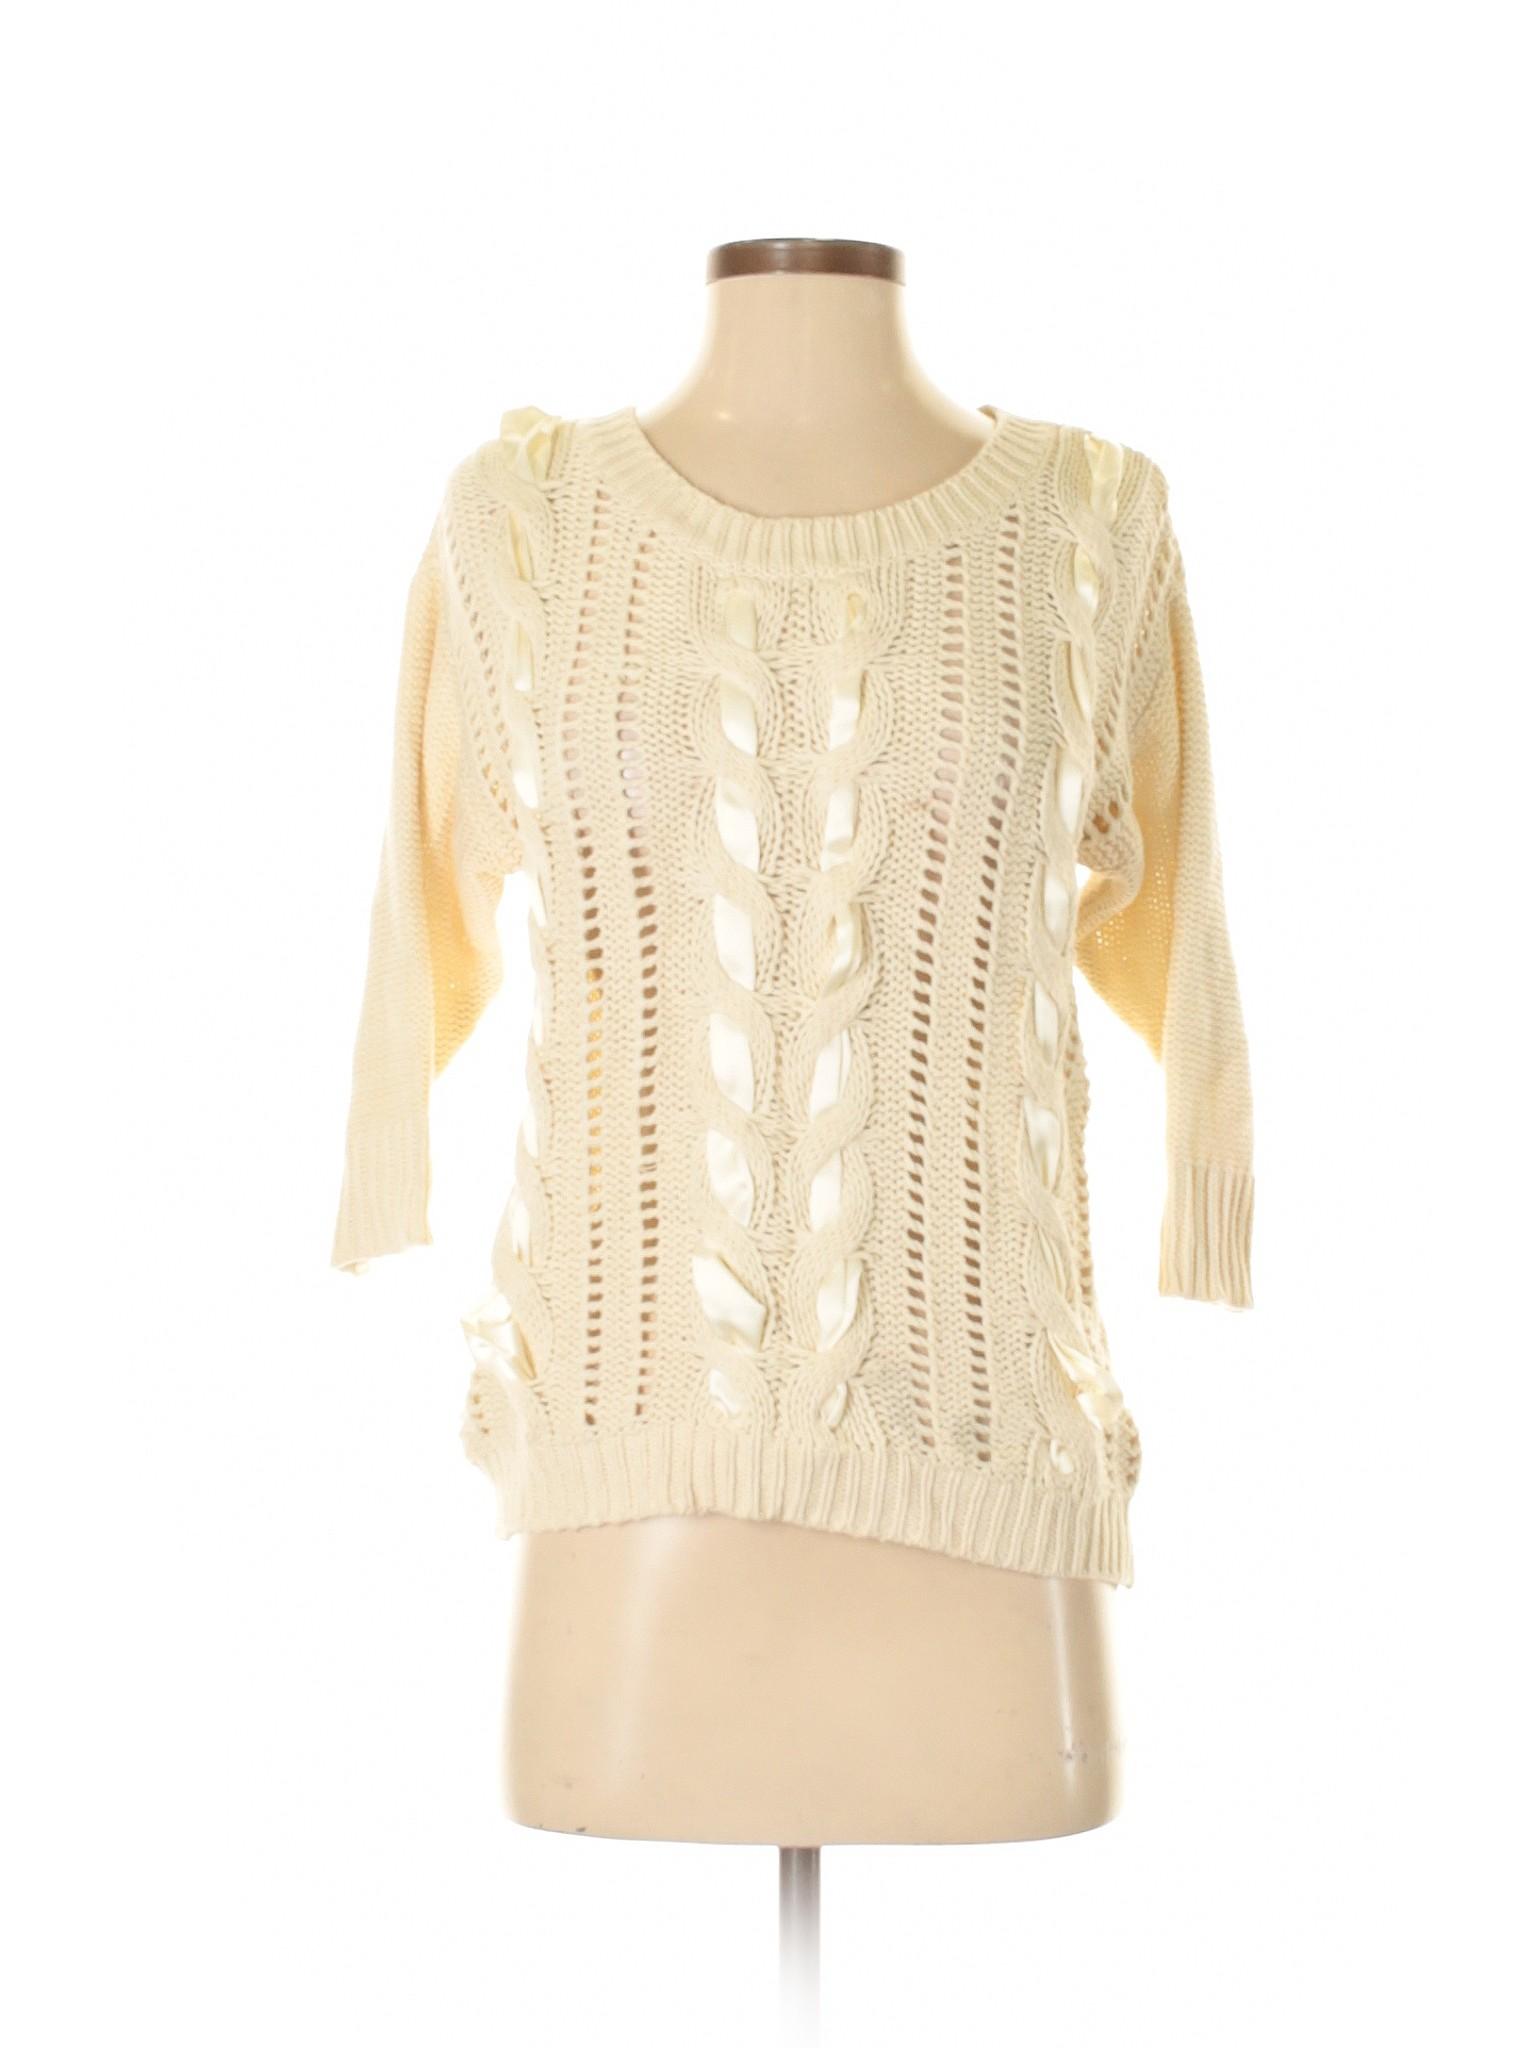 Pullover Boutique Sweater Boutique Lauren Lauren Conrad w7x5gIq